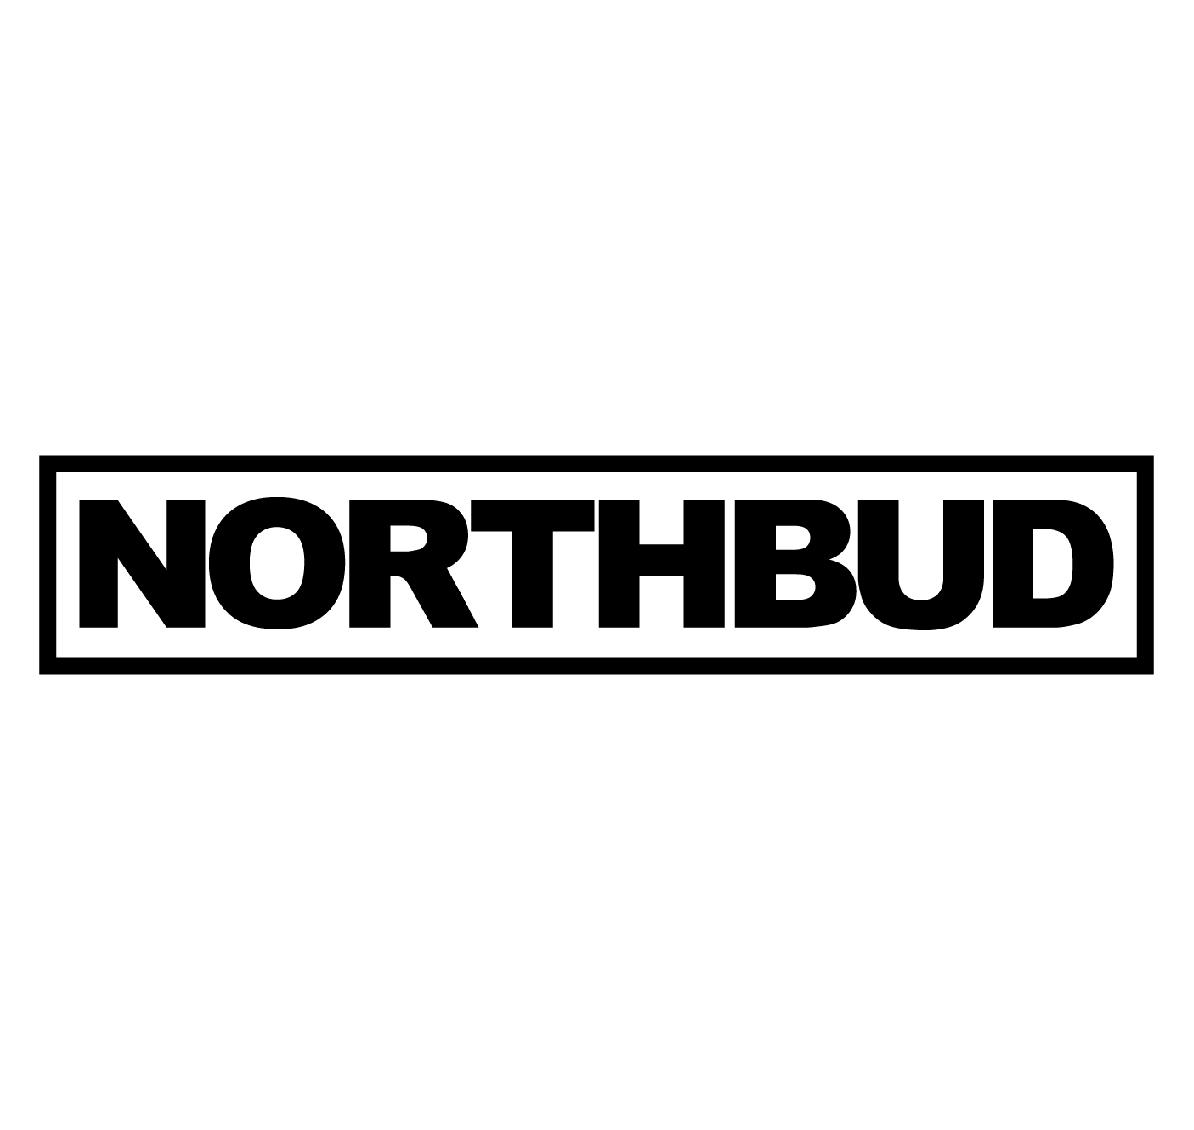 North Bud Farms Provides Update on U.S